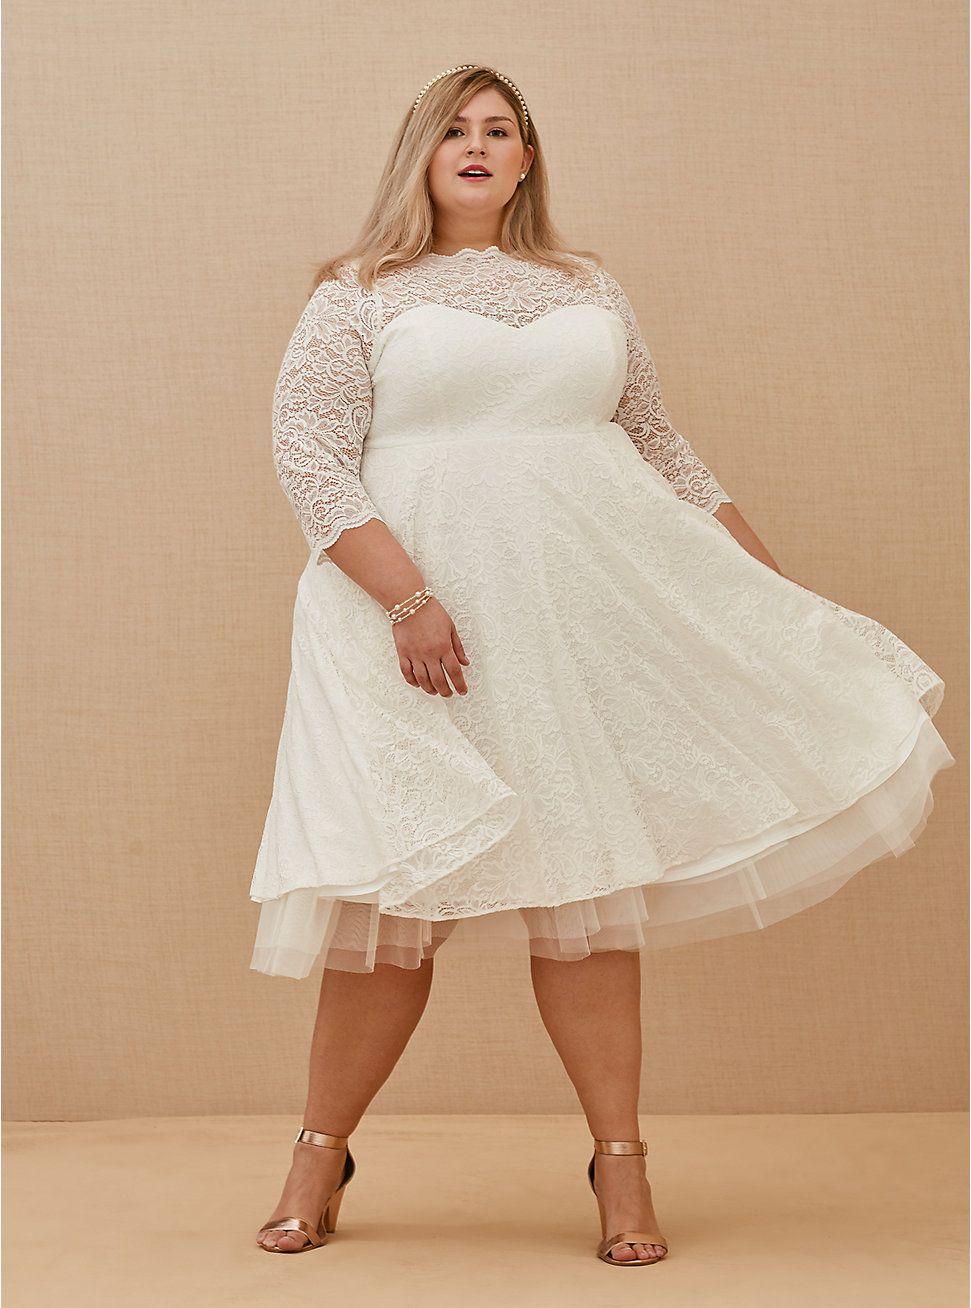 Ivory Lace Tea Length Wedding Dress Short Wedding Dress Tea Length Wedding Dress Casual Wedding Attire [ 1308 x 971 Pixel ]